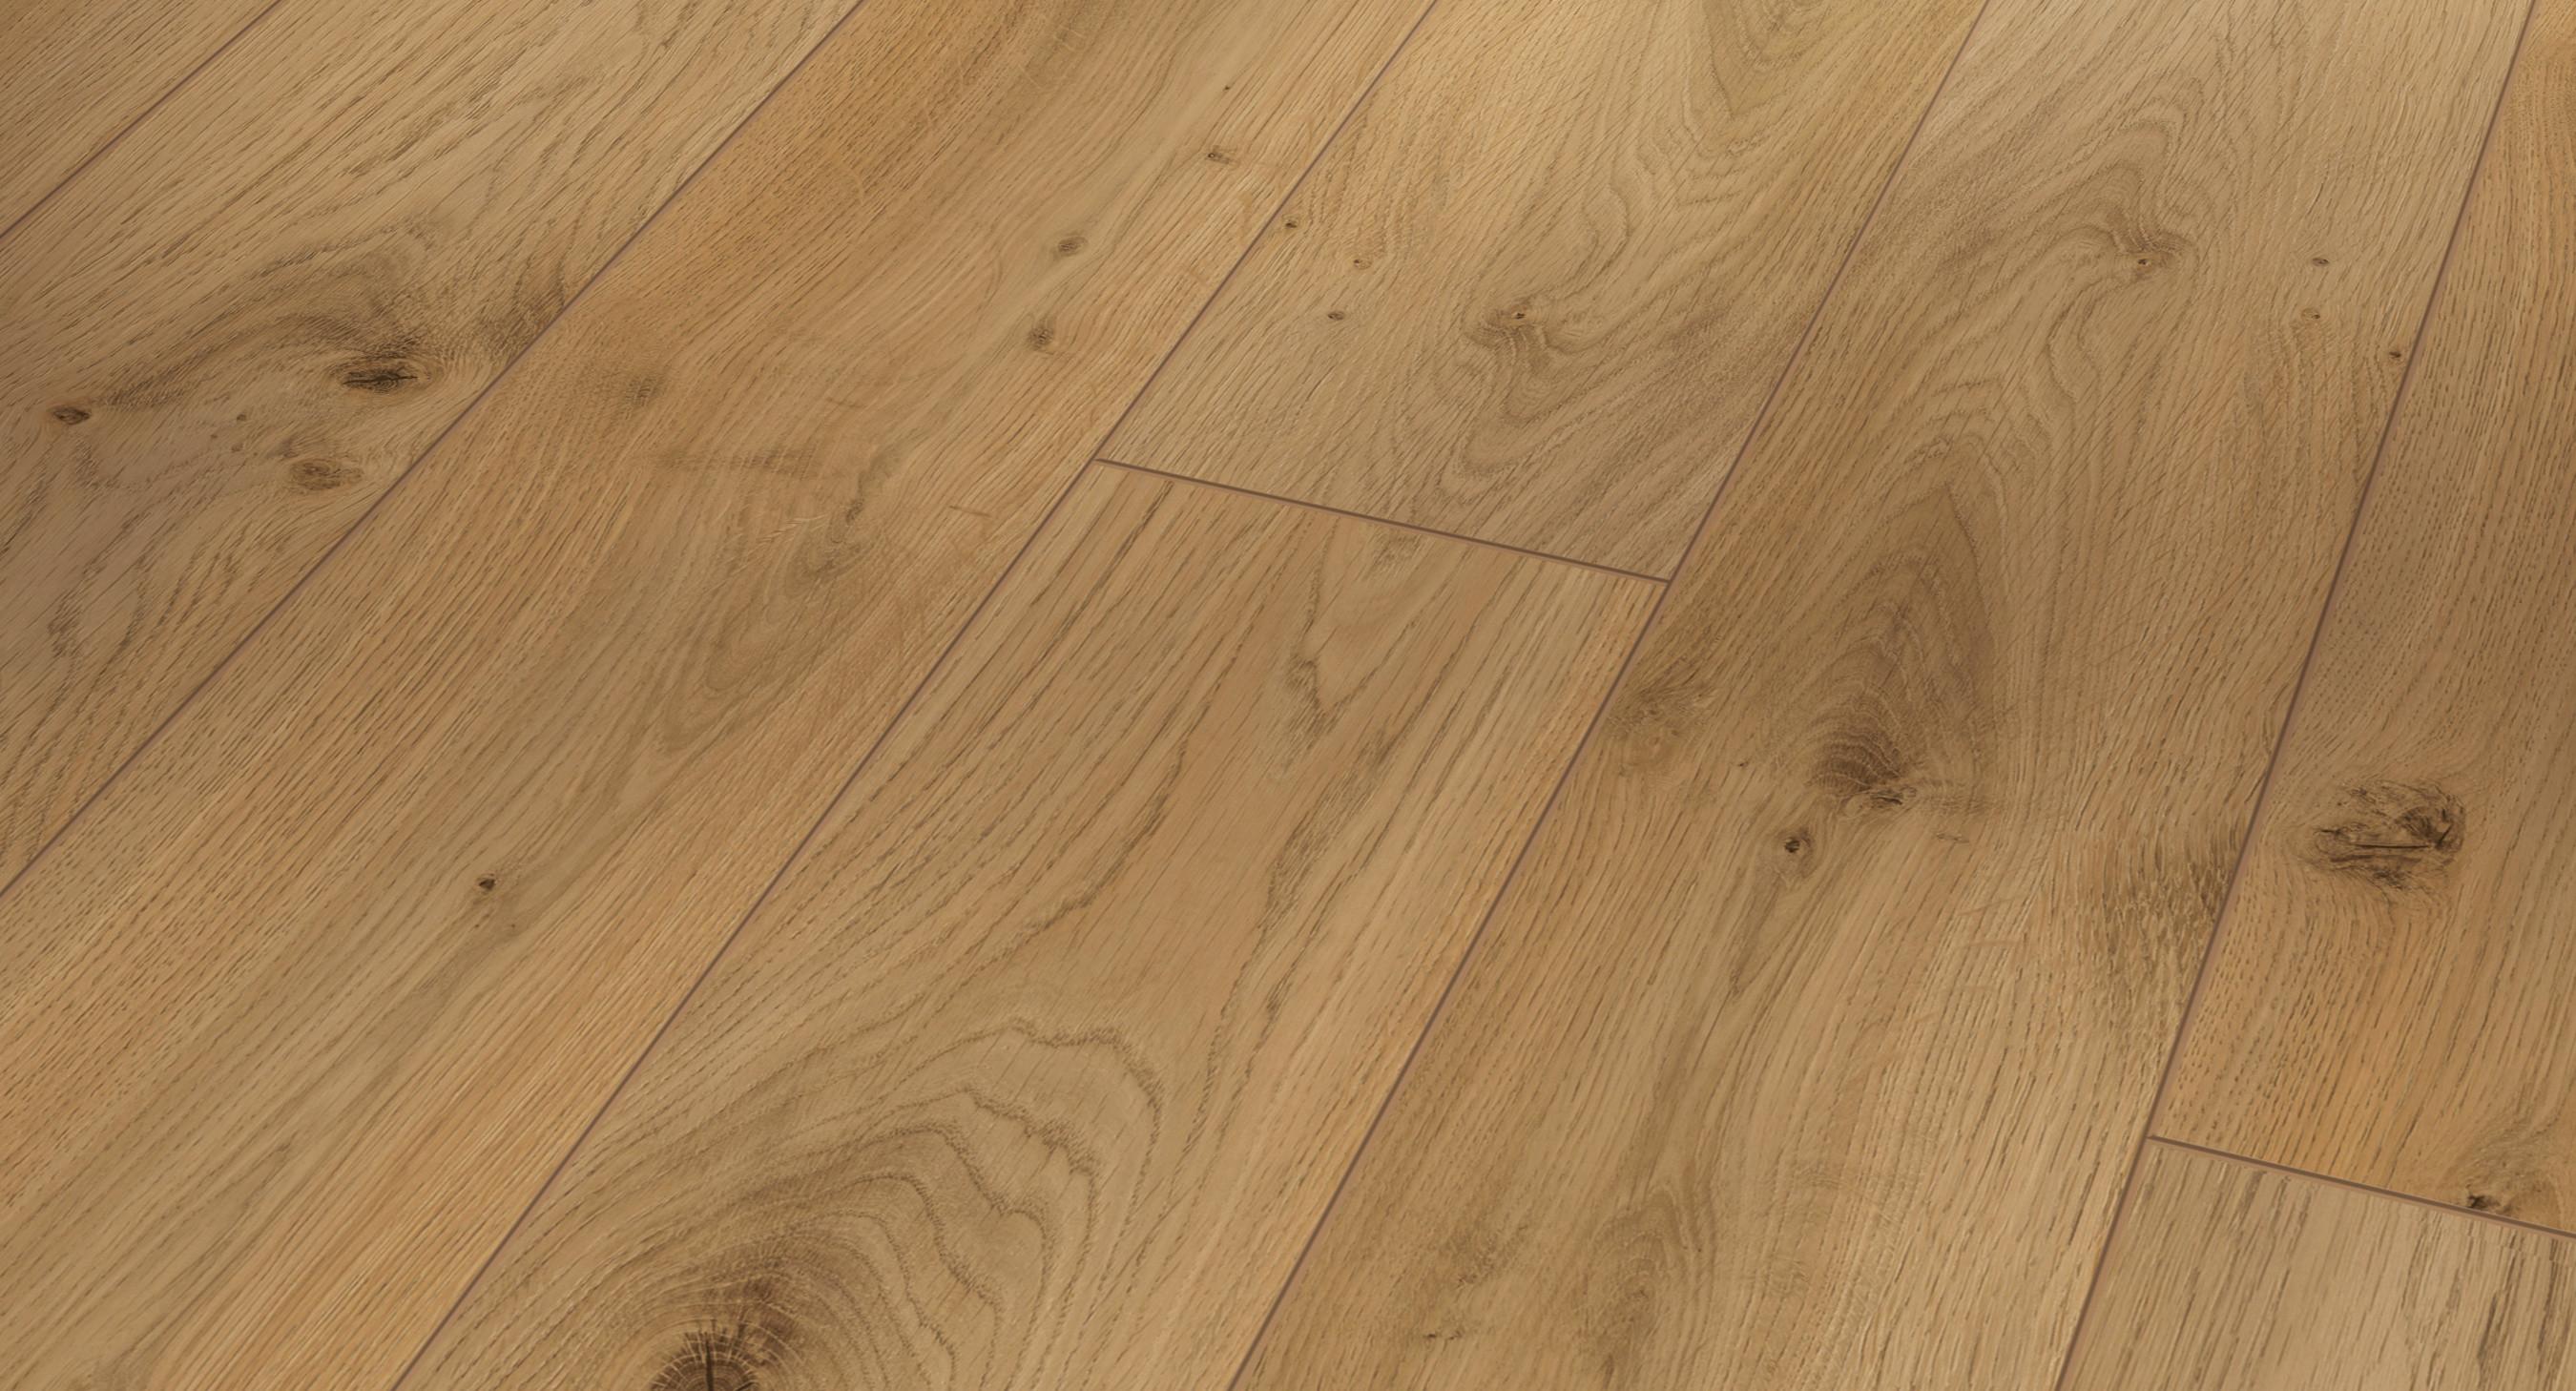 10 Elegant Gemwoods Acacia Hardwood Flooring 2021 free download gemwoods acacia hardwood flooring of classic wood floors awesome furnaced brown parquet classic wood with regard to classic wood floors beautiful classic laminate flooring products classic w